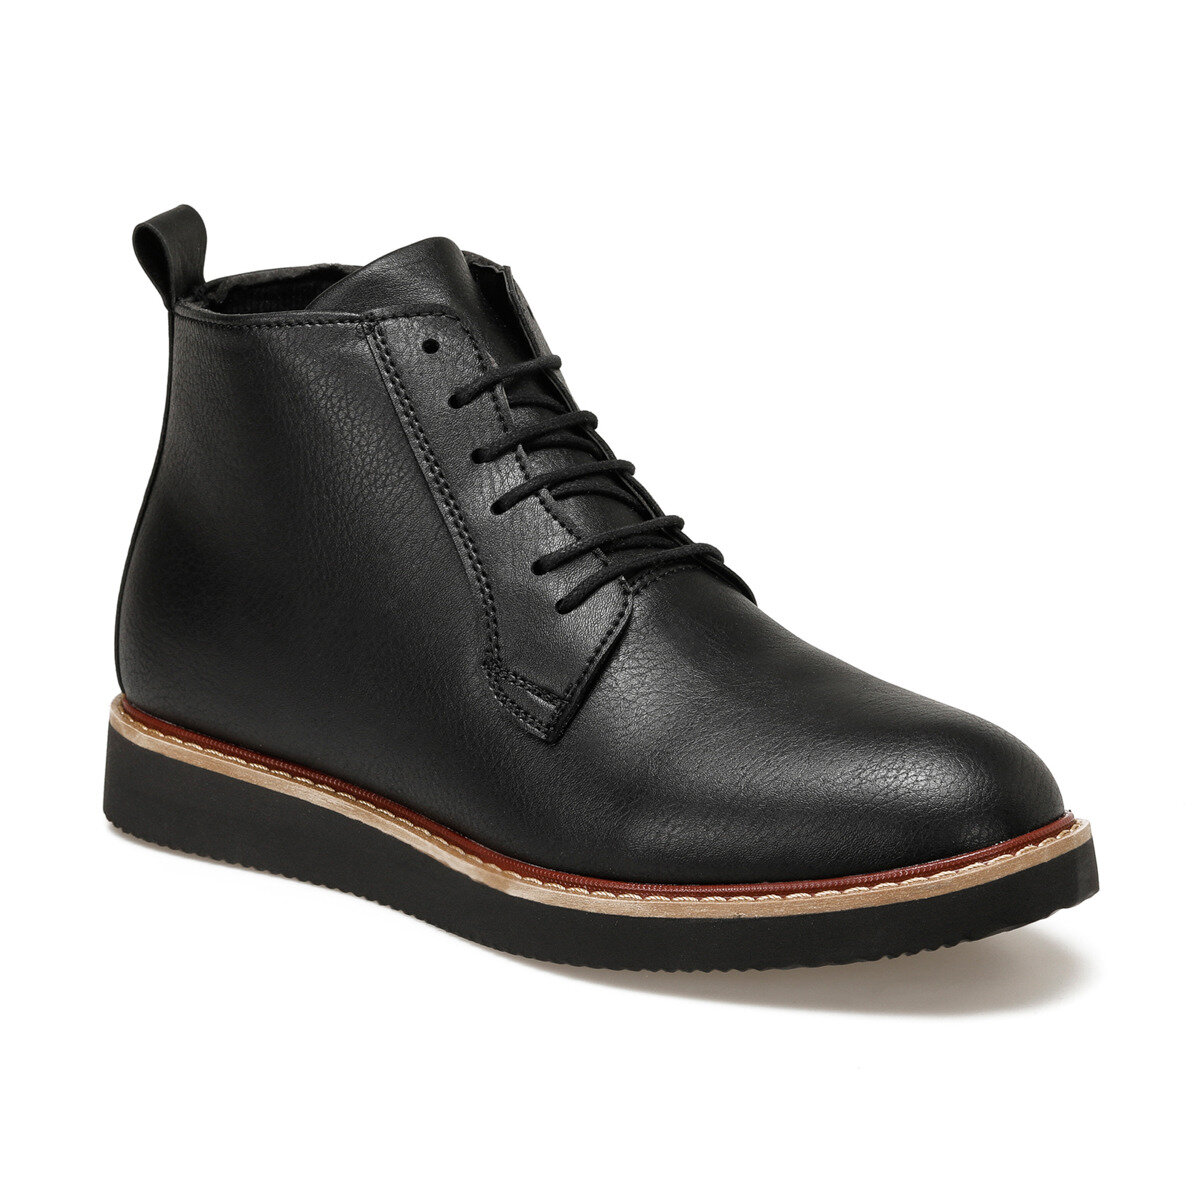 FLO 3321-2 czarne męskie buty jj-stiller